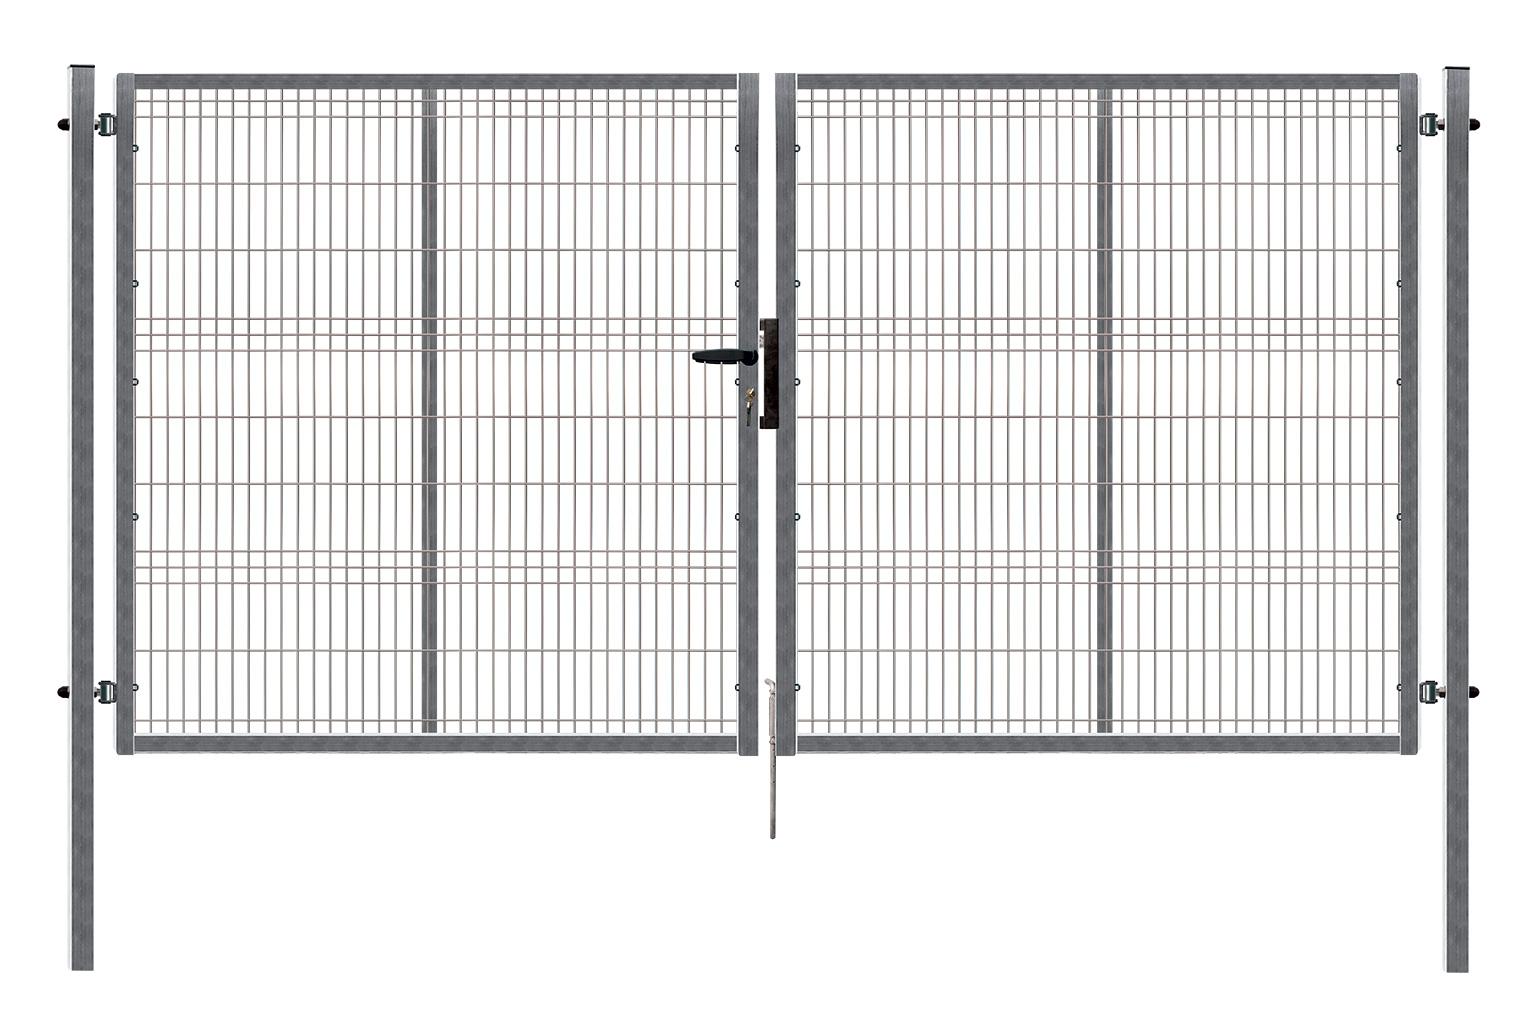 Brána PILOFOR dvoukřídlá, 4118x1745 mm, Zn 79,6Kg